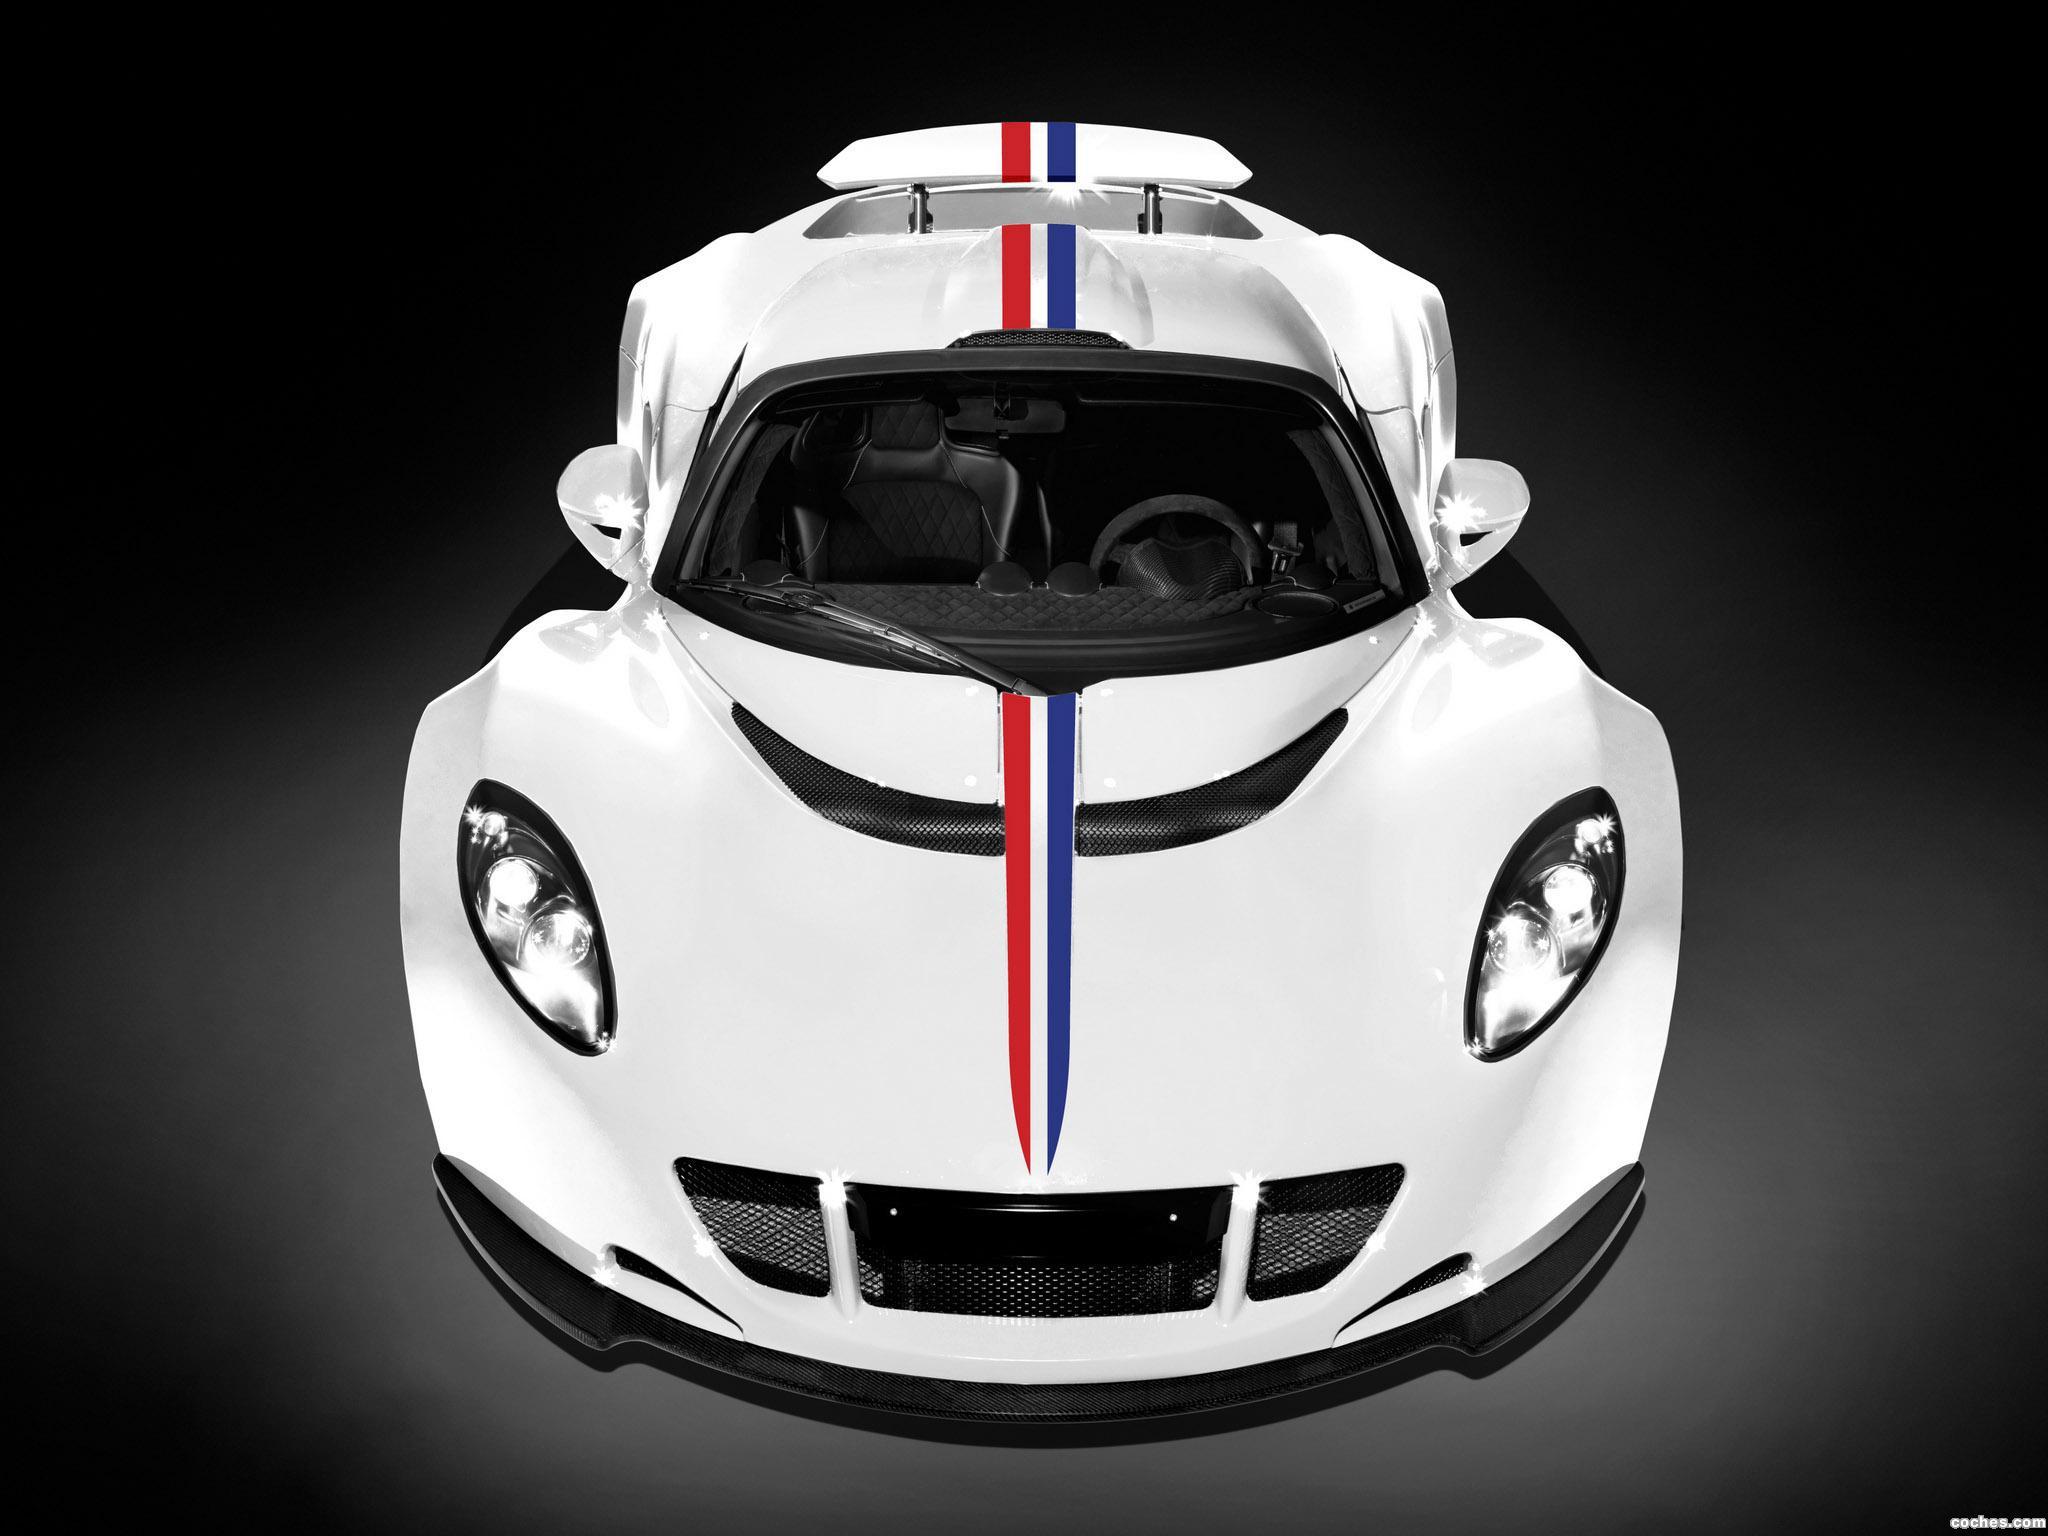 Foto 0 de Hennessey Performance Venom GT World's Fastest Car 2014